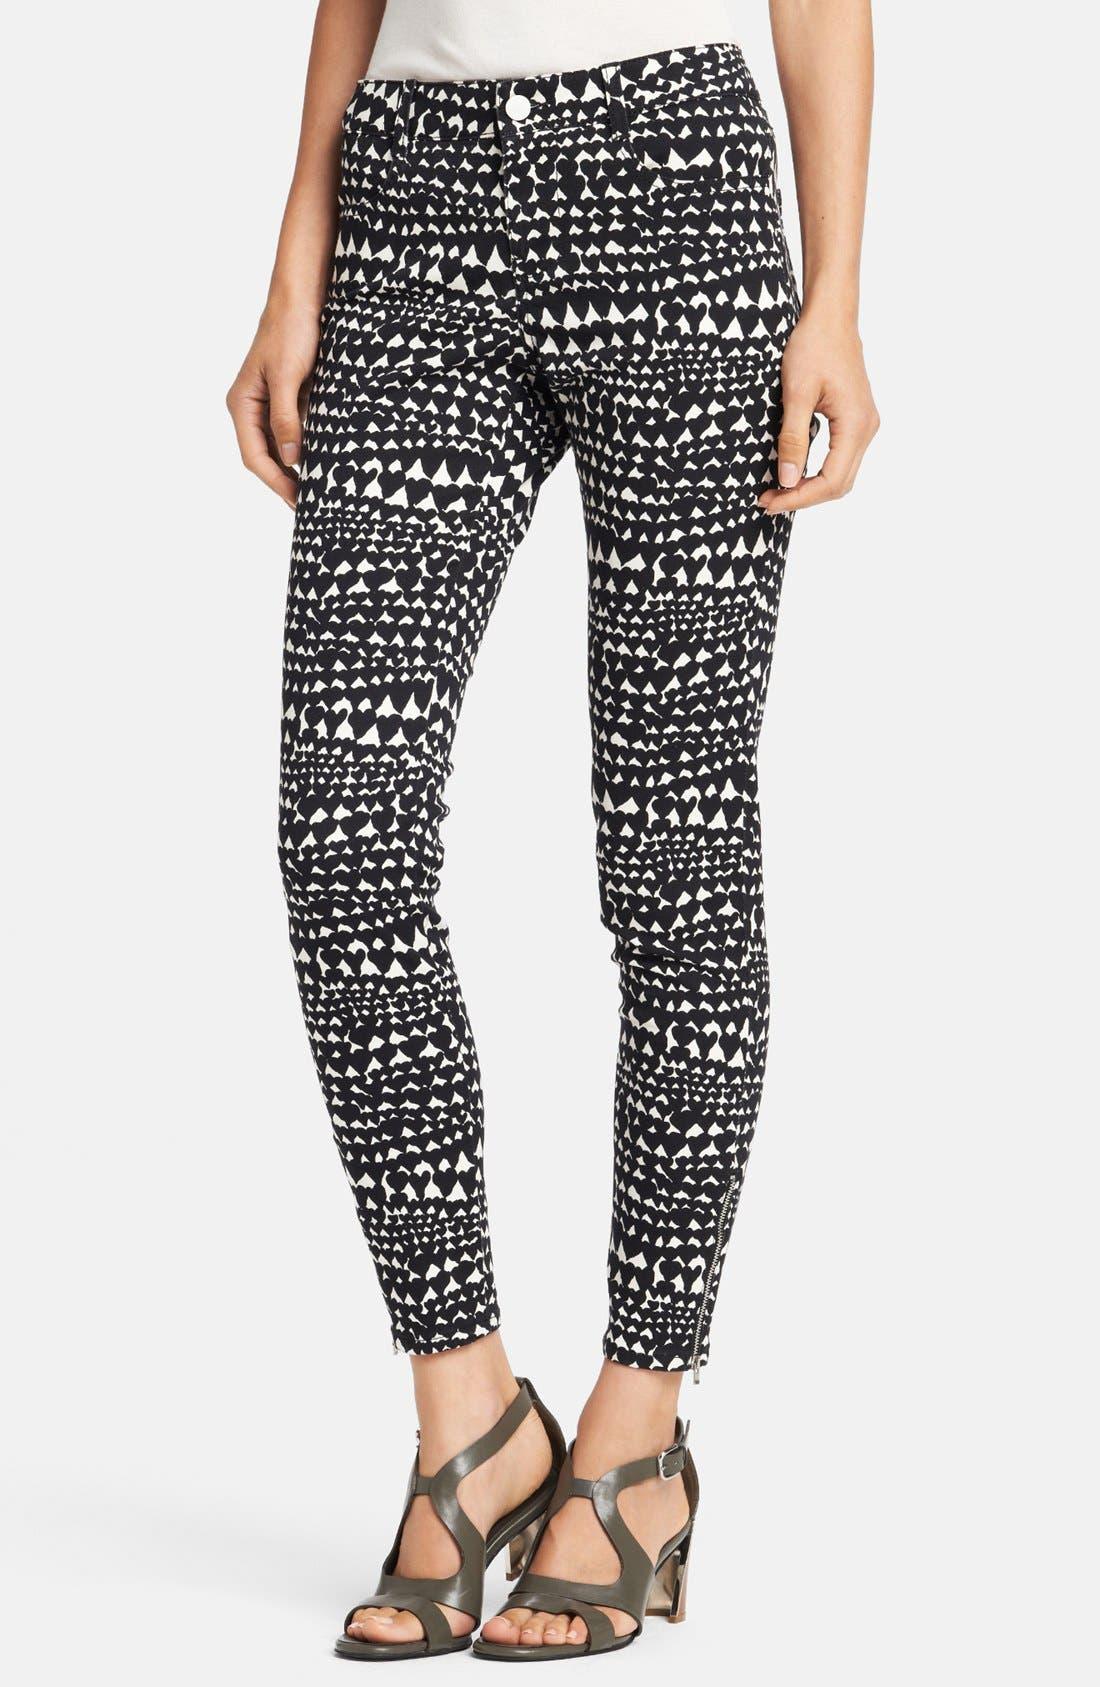 Alternate Image 1 Selected - Stella McCartney 'Jessica' Heart Print Skinny Ankle Zip Jeans